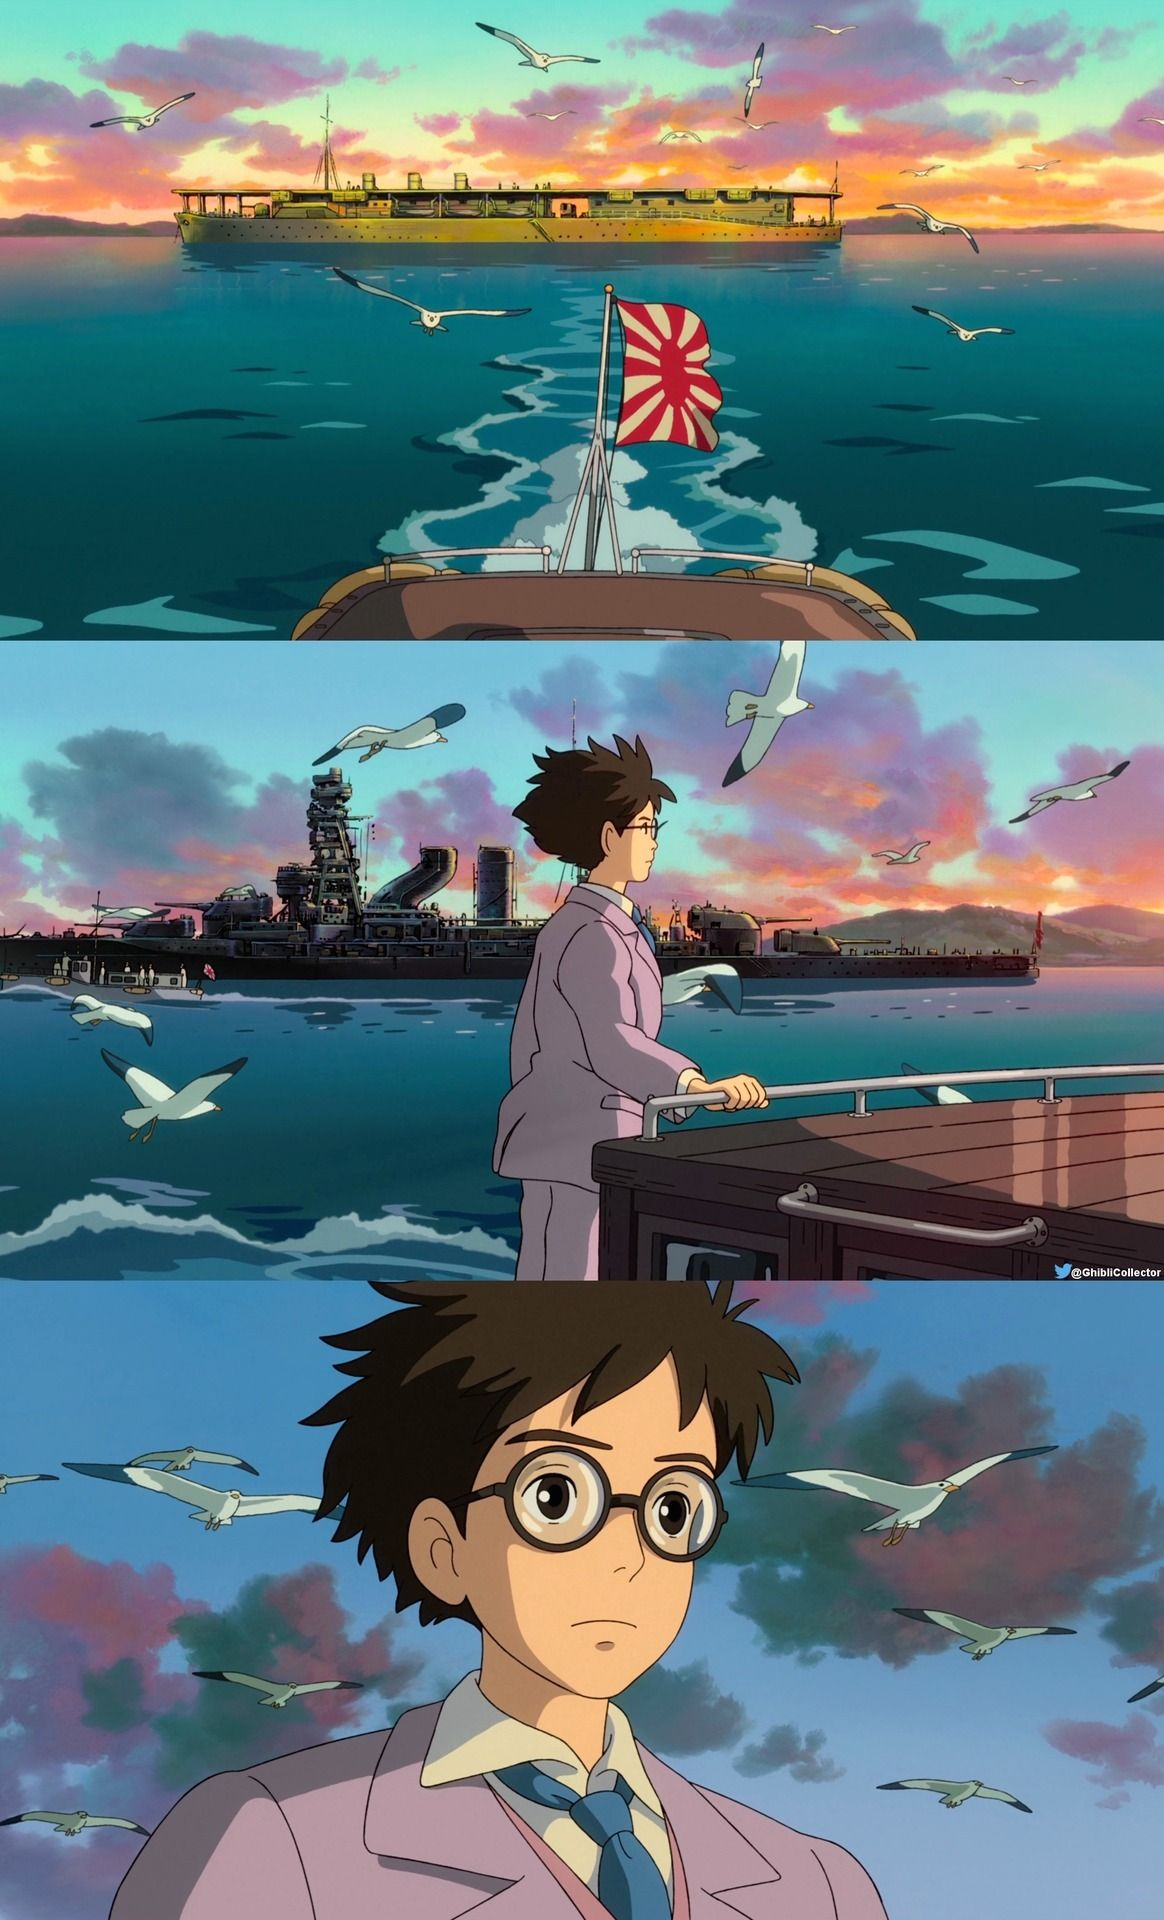 ALL HAYAO MIYAZAKI SHORT MOVIES